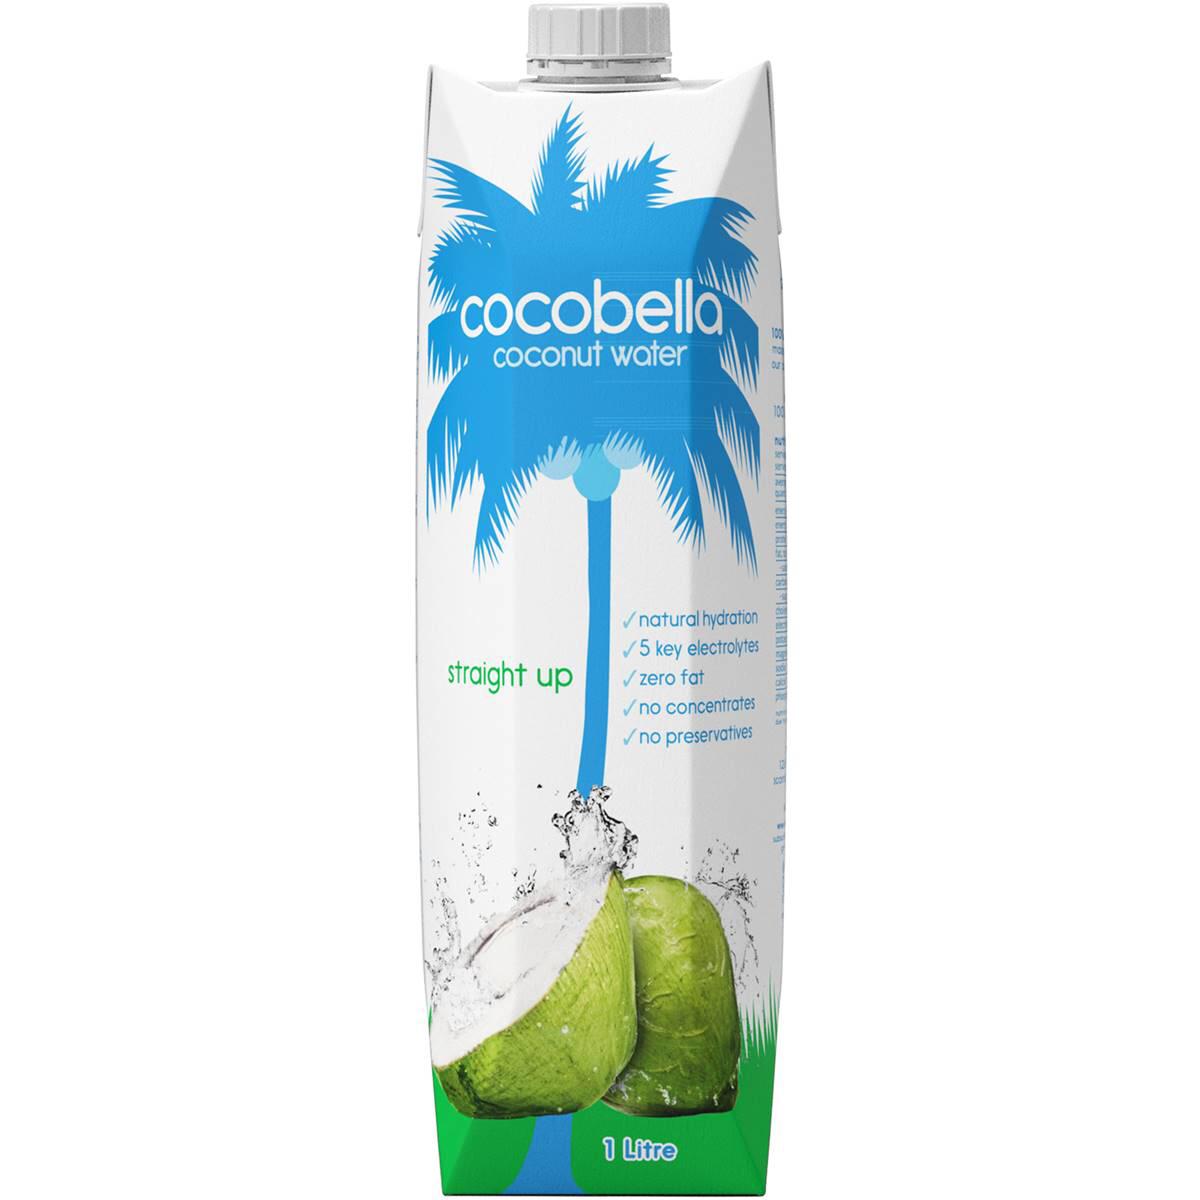 COCOBELLA COCONUT WATER (1 LITRE)